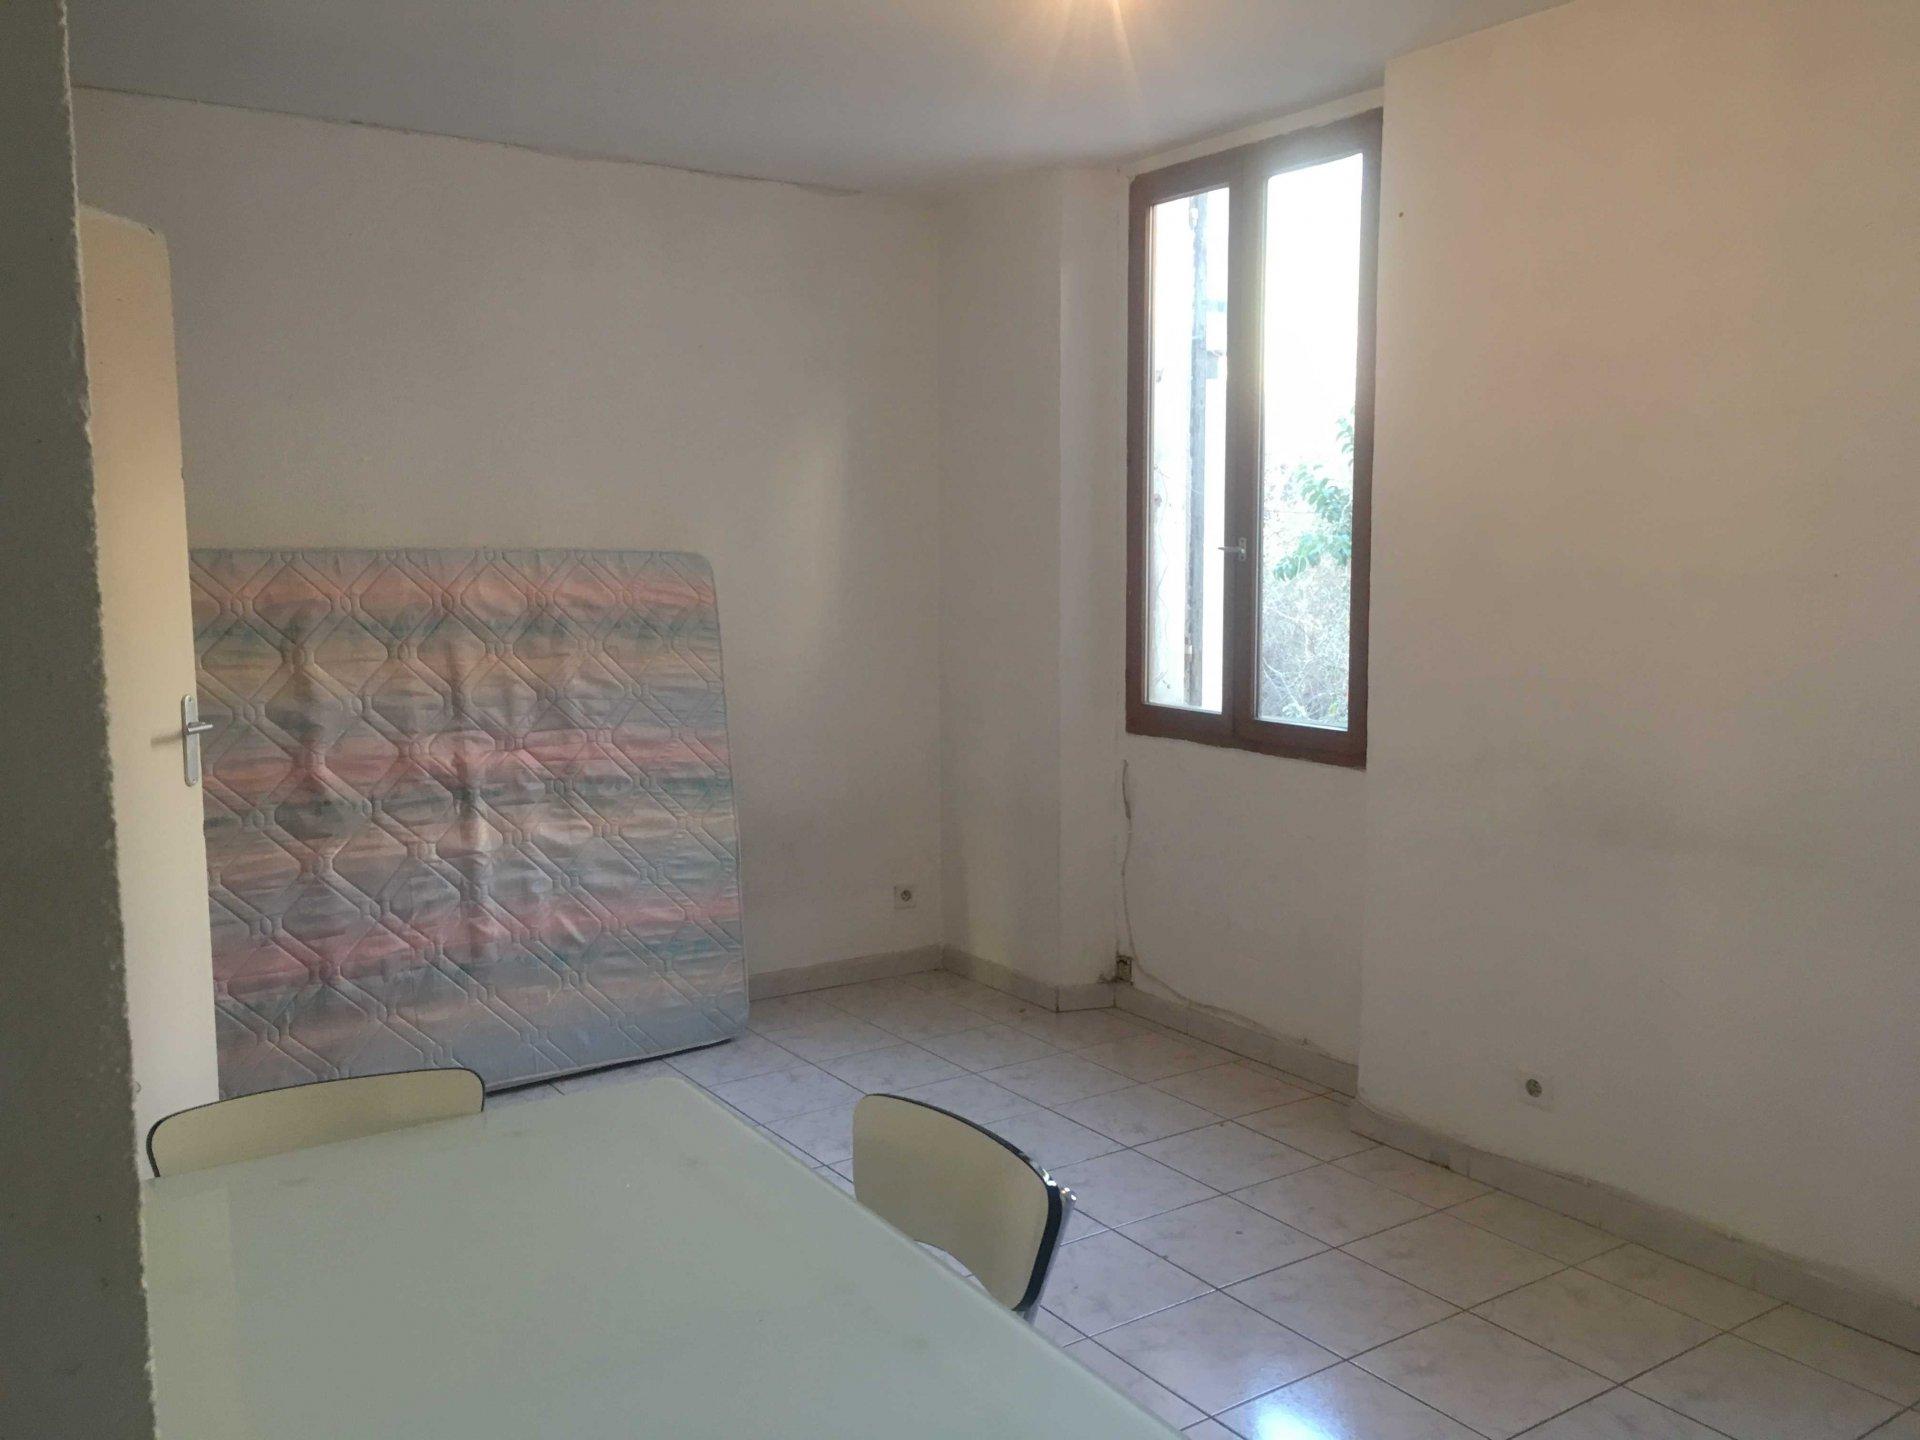 Vente lot de 2 studios de 21m2 quartier Thiers 13001 Marseille